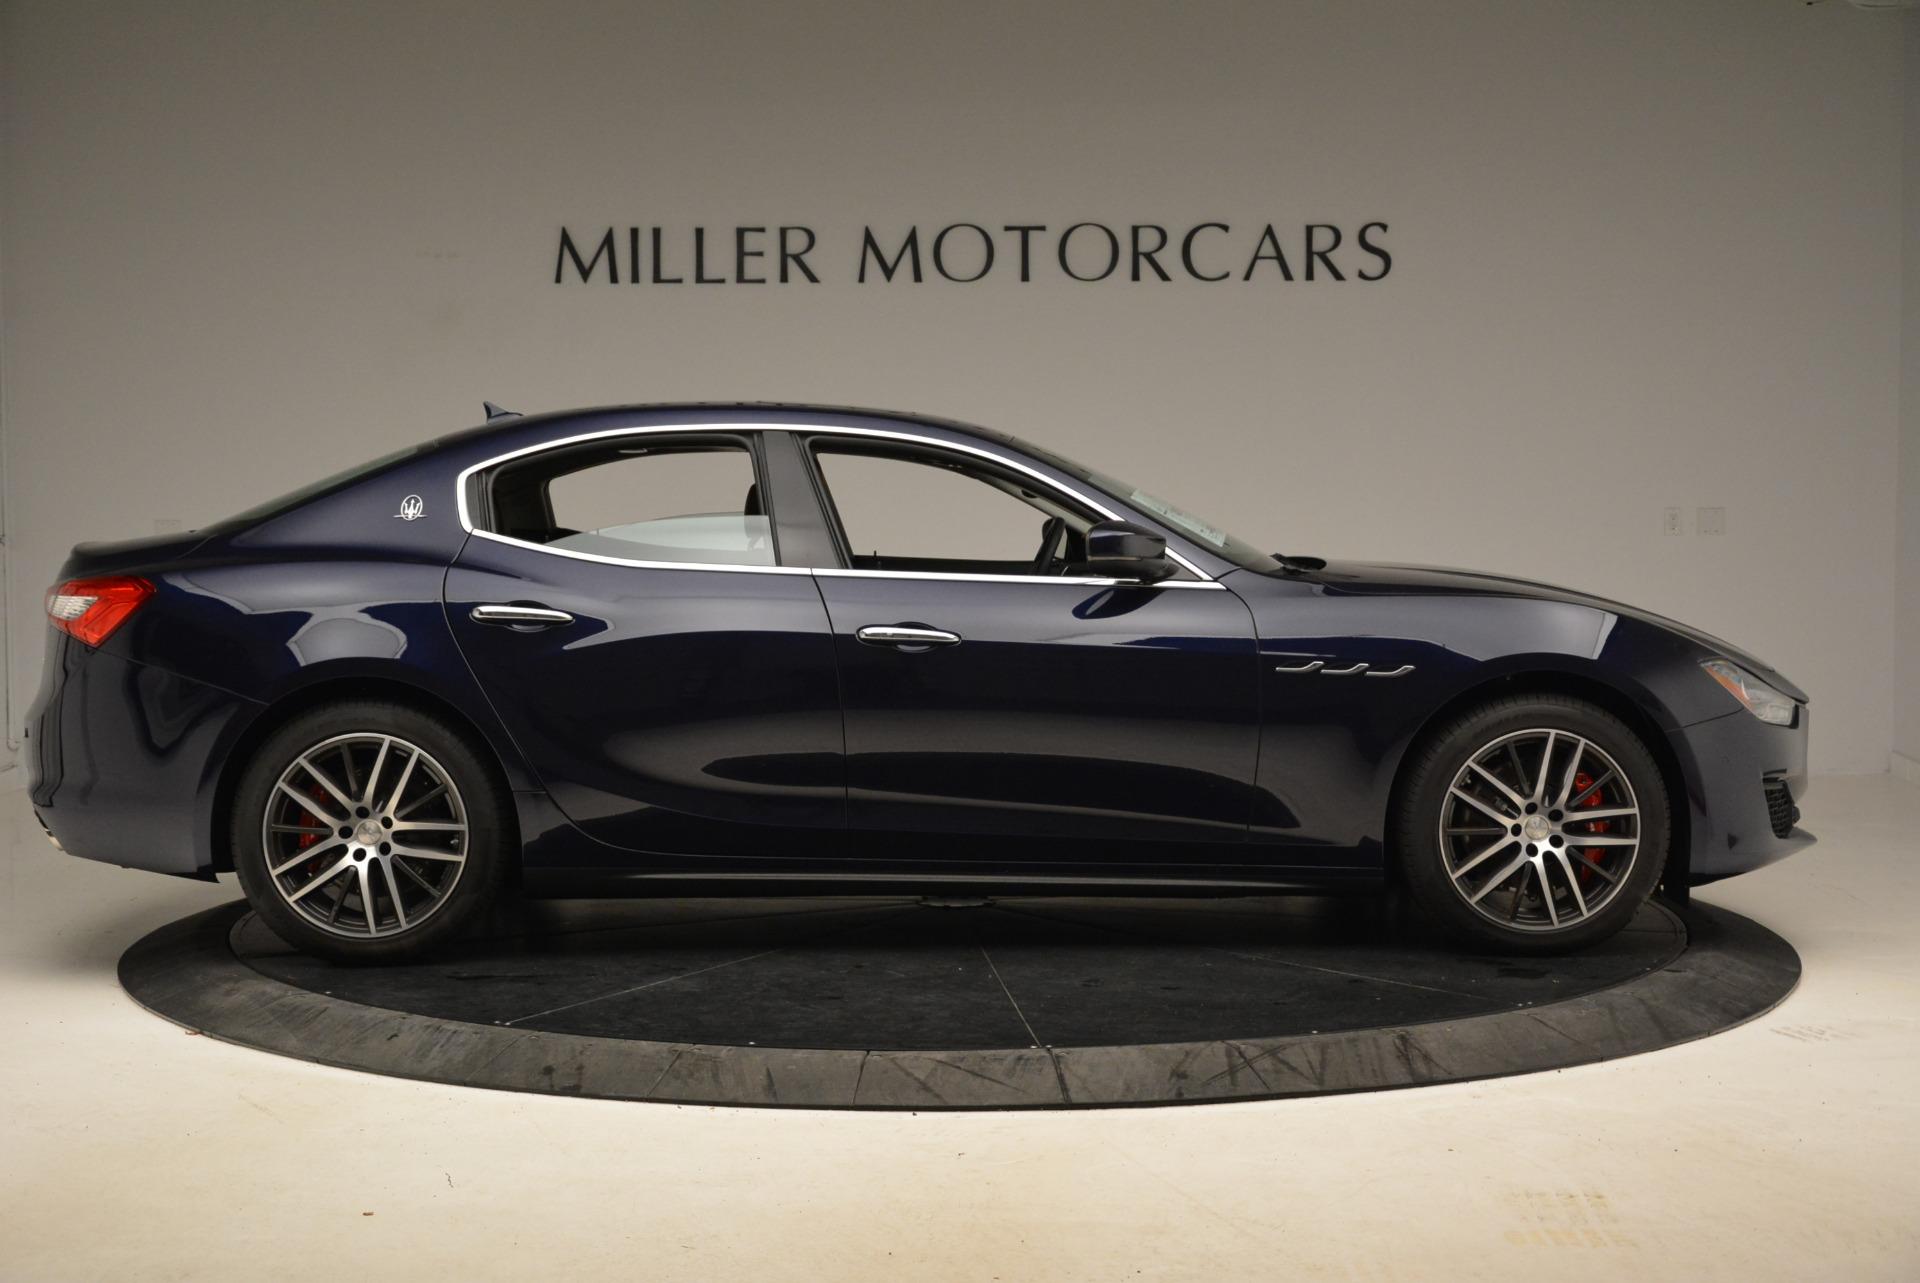 New 2019 Maserati Ghibli S Q4 For Sale 87370 In Greenwich, CT